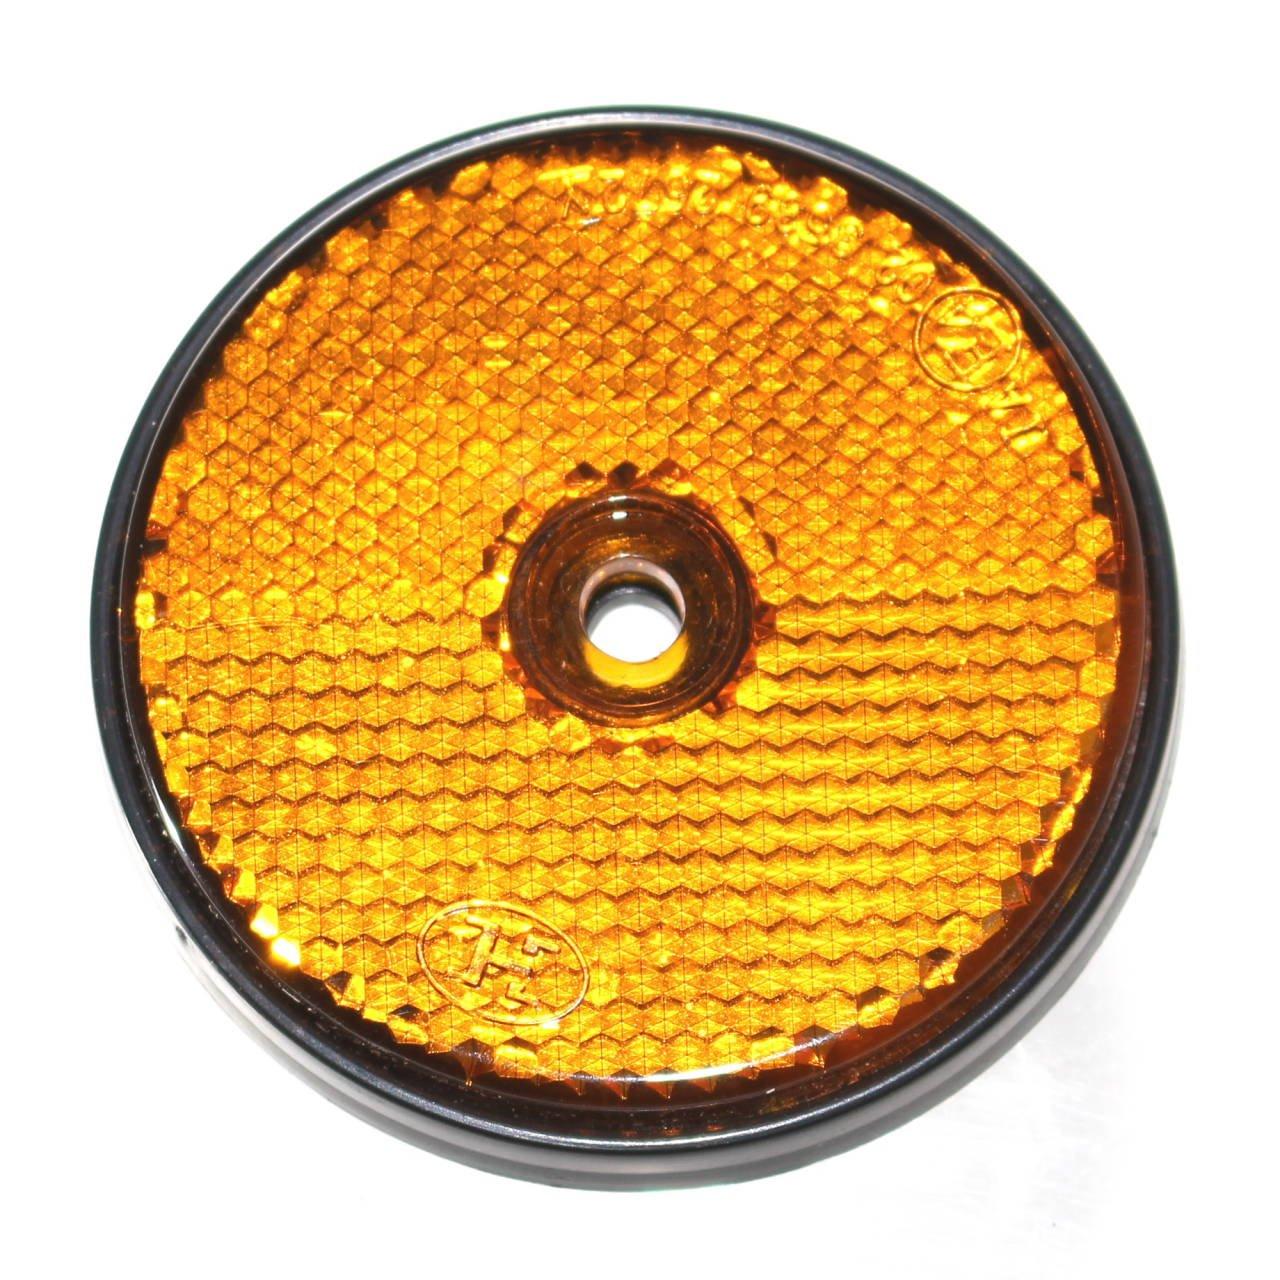 DKB Reflektor Rund /Ø 60 mm R/ückstrahler Orange f H/änger Trailer Reflektor Katzenauge